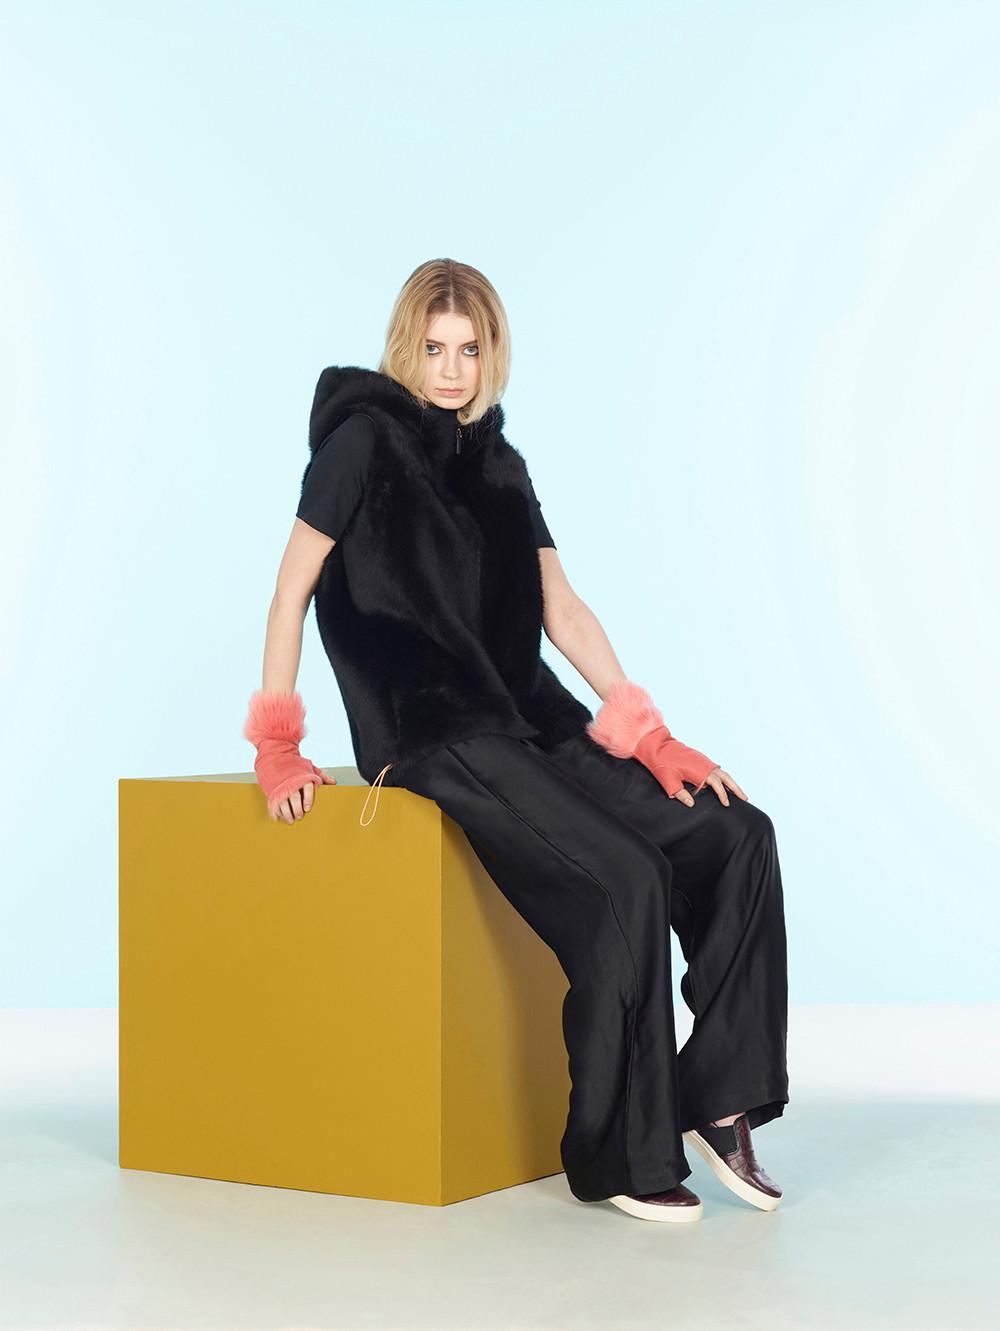 London fashion photography at RGB Digital's West London studio